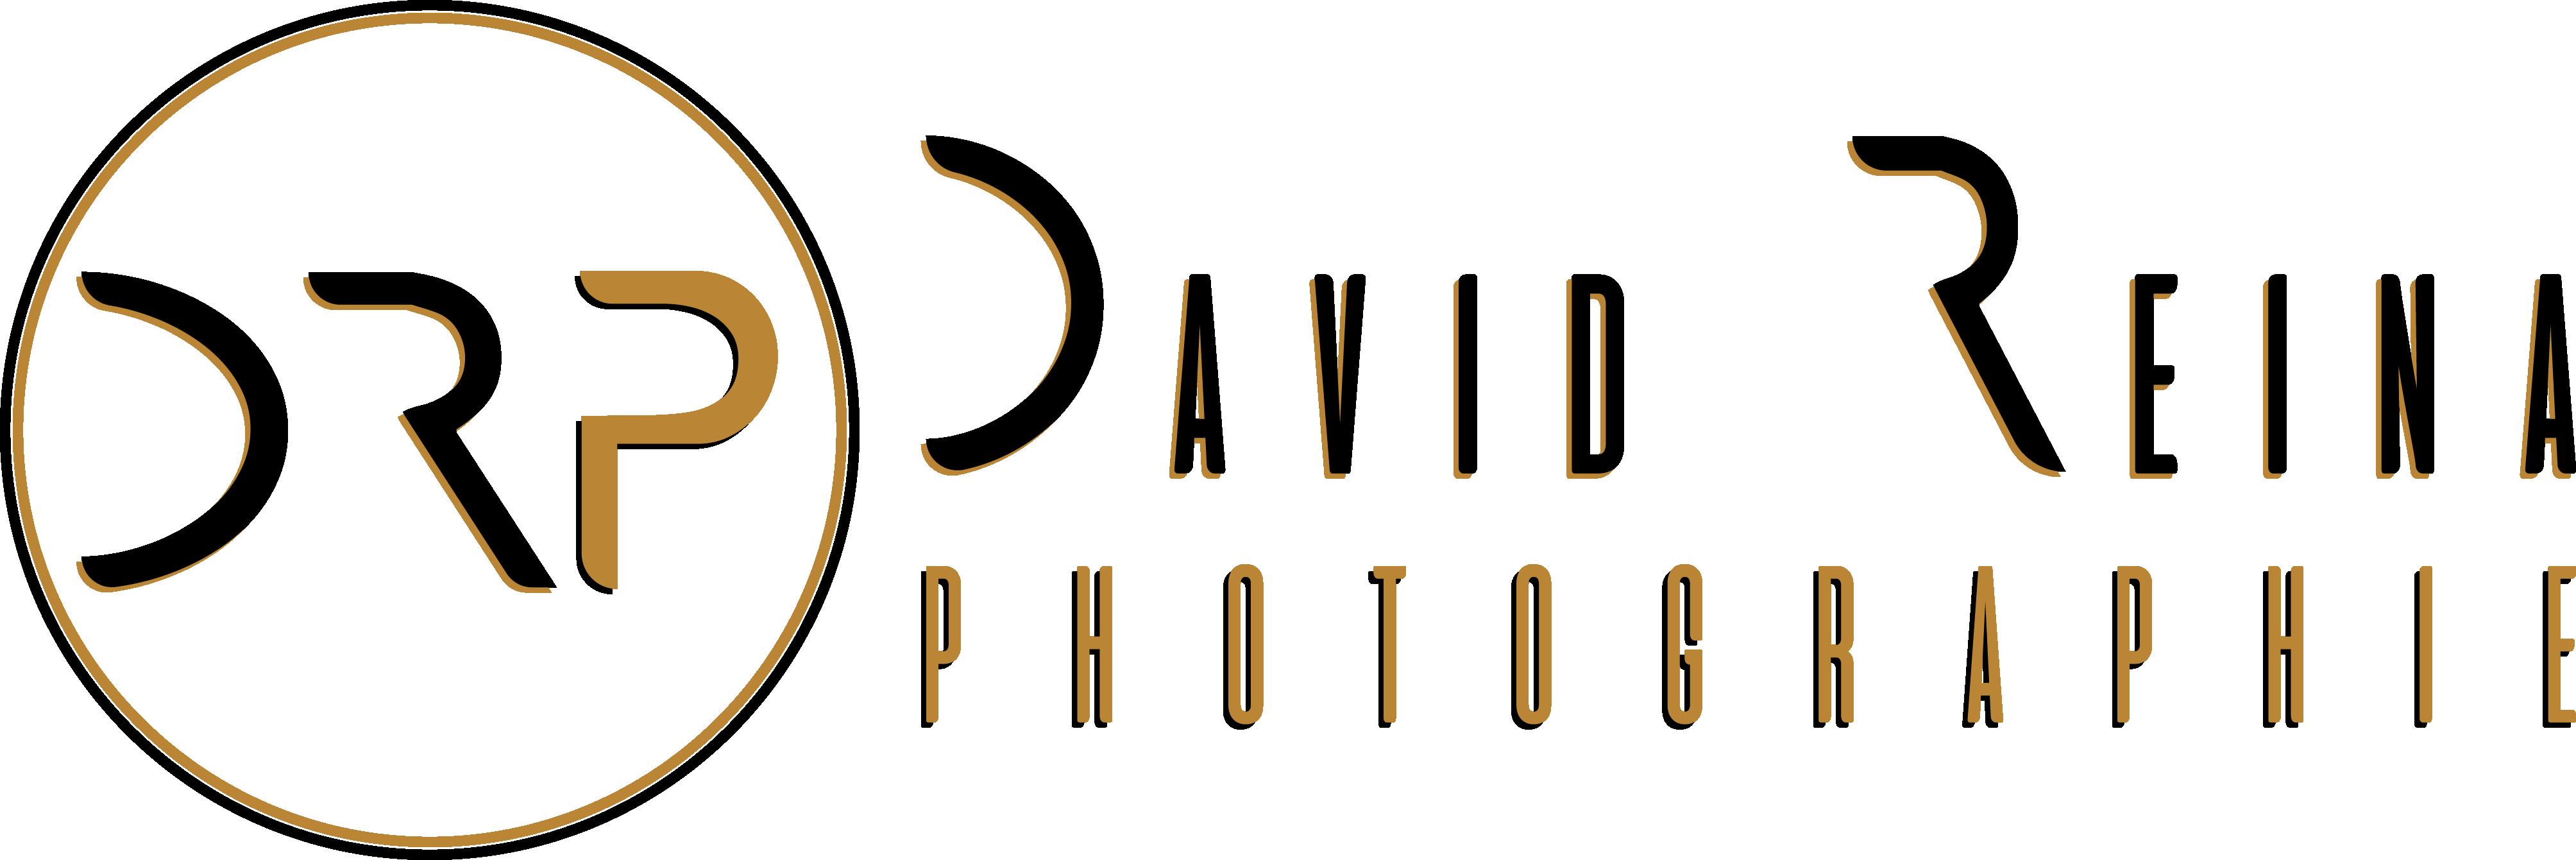 David Reina Photographie